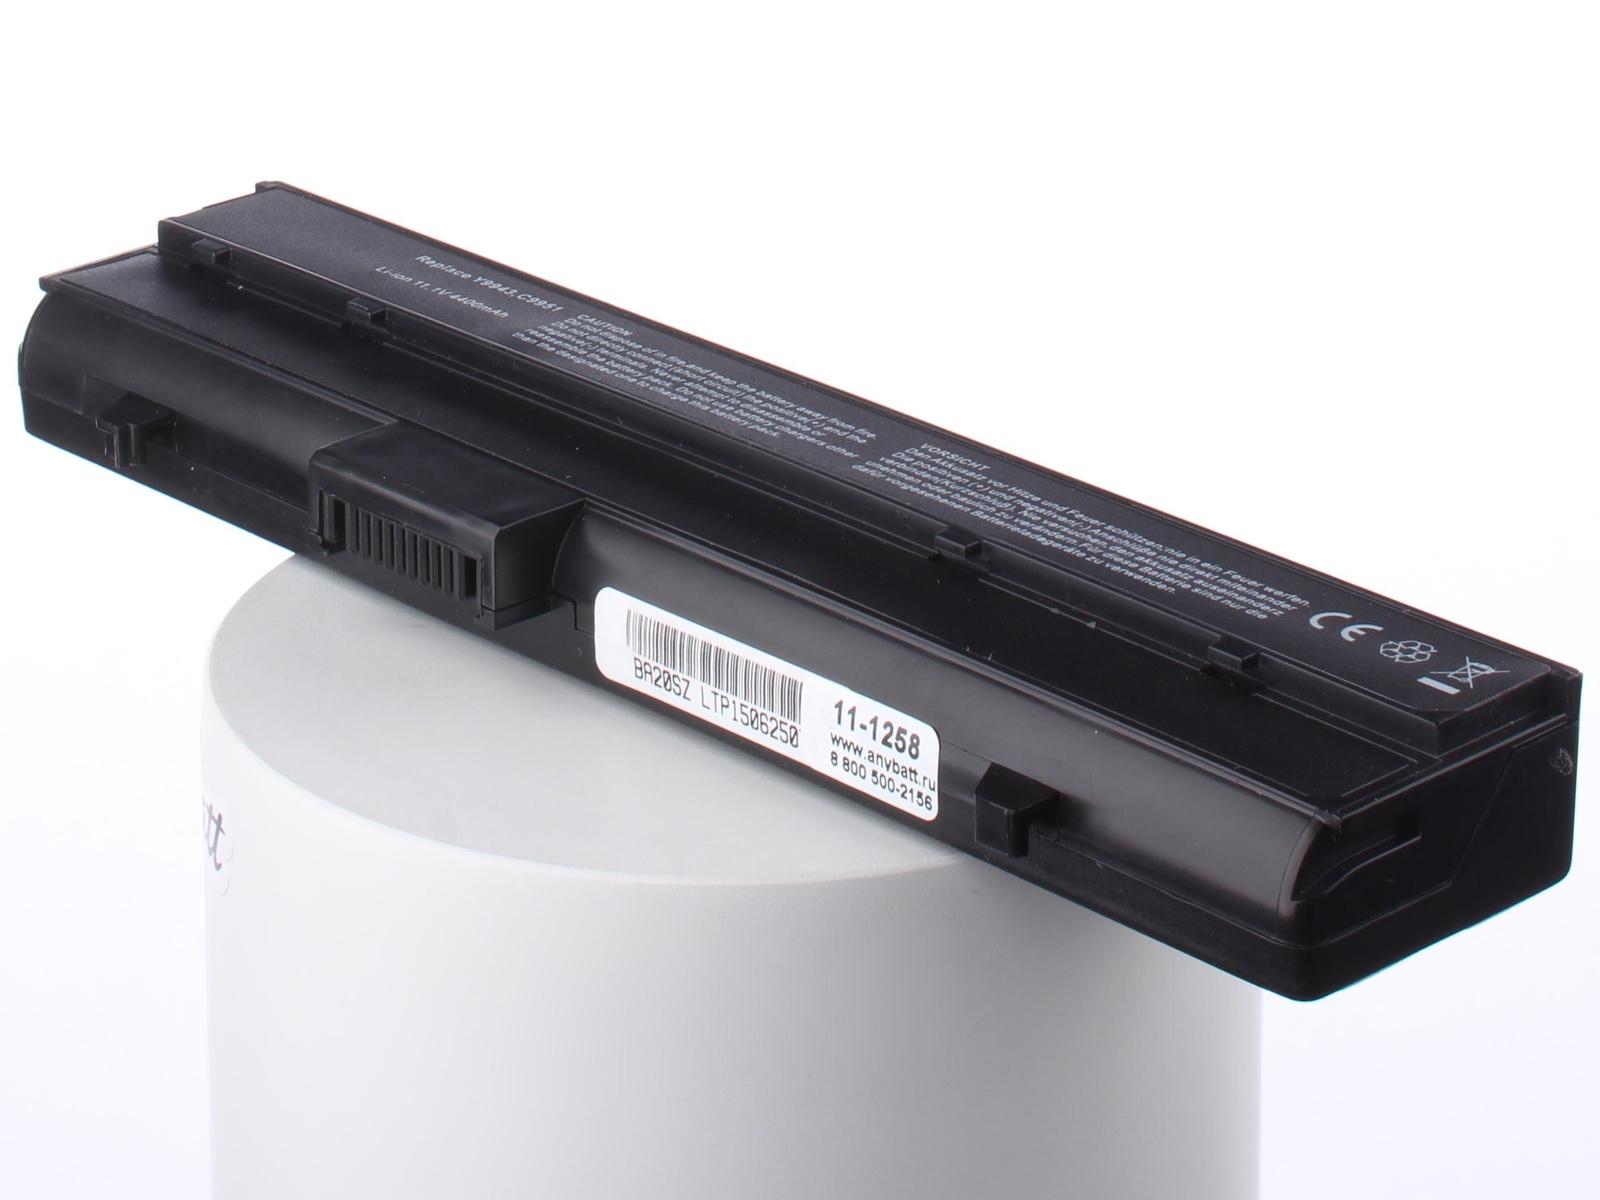 Фото - Аккумуляторная батарея AnyBatt 11-A1-1258 4400mAh для ноутбуков Dell RC107, WG400, YG310, FC141, C9553, DC224, CC156, Y9943, UG679, аккумуляторная батарея для ноутбуков dell primary 6 cell 65w hr expresscharge capable kit 451 11980